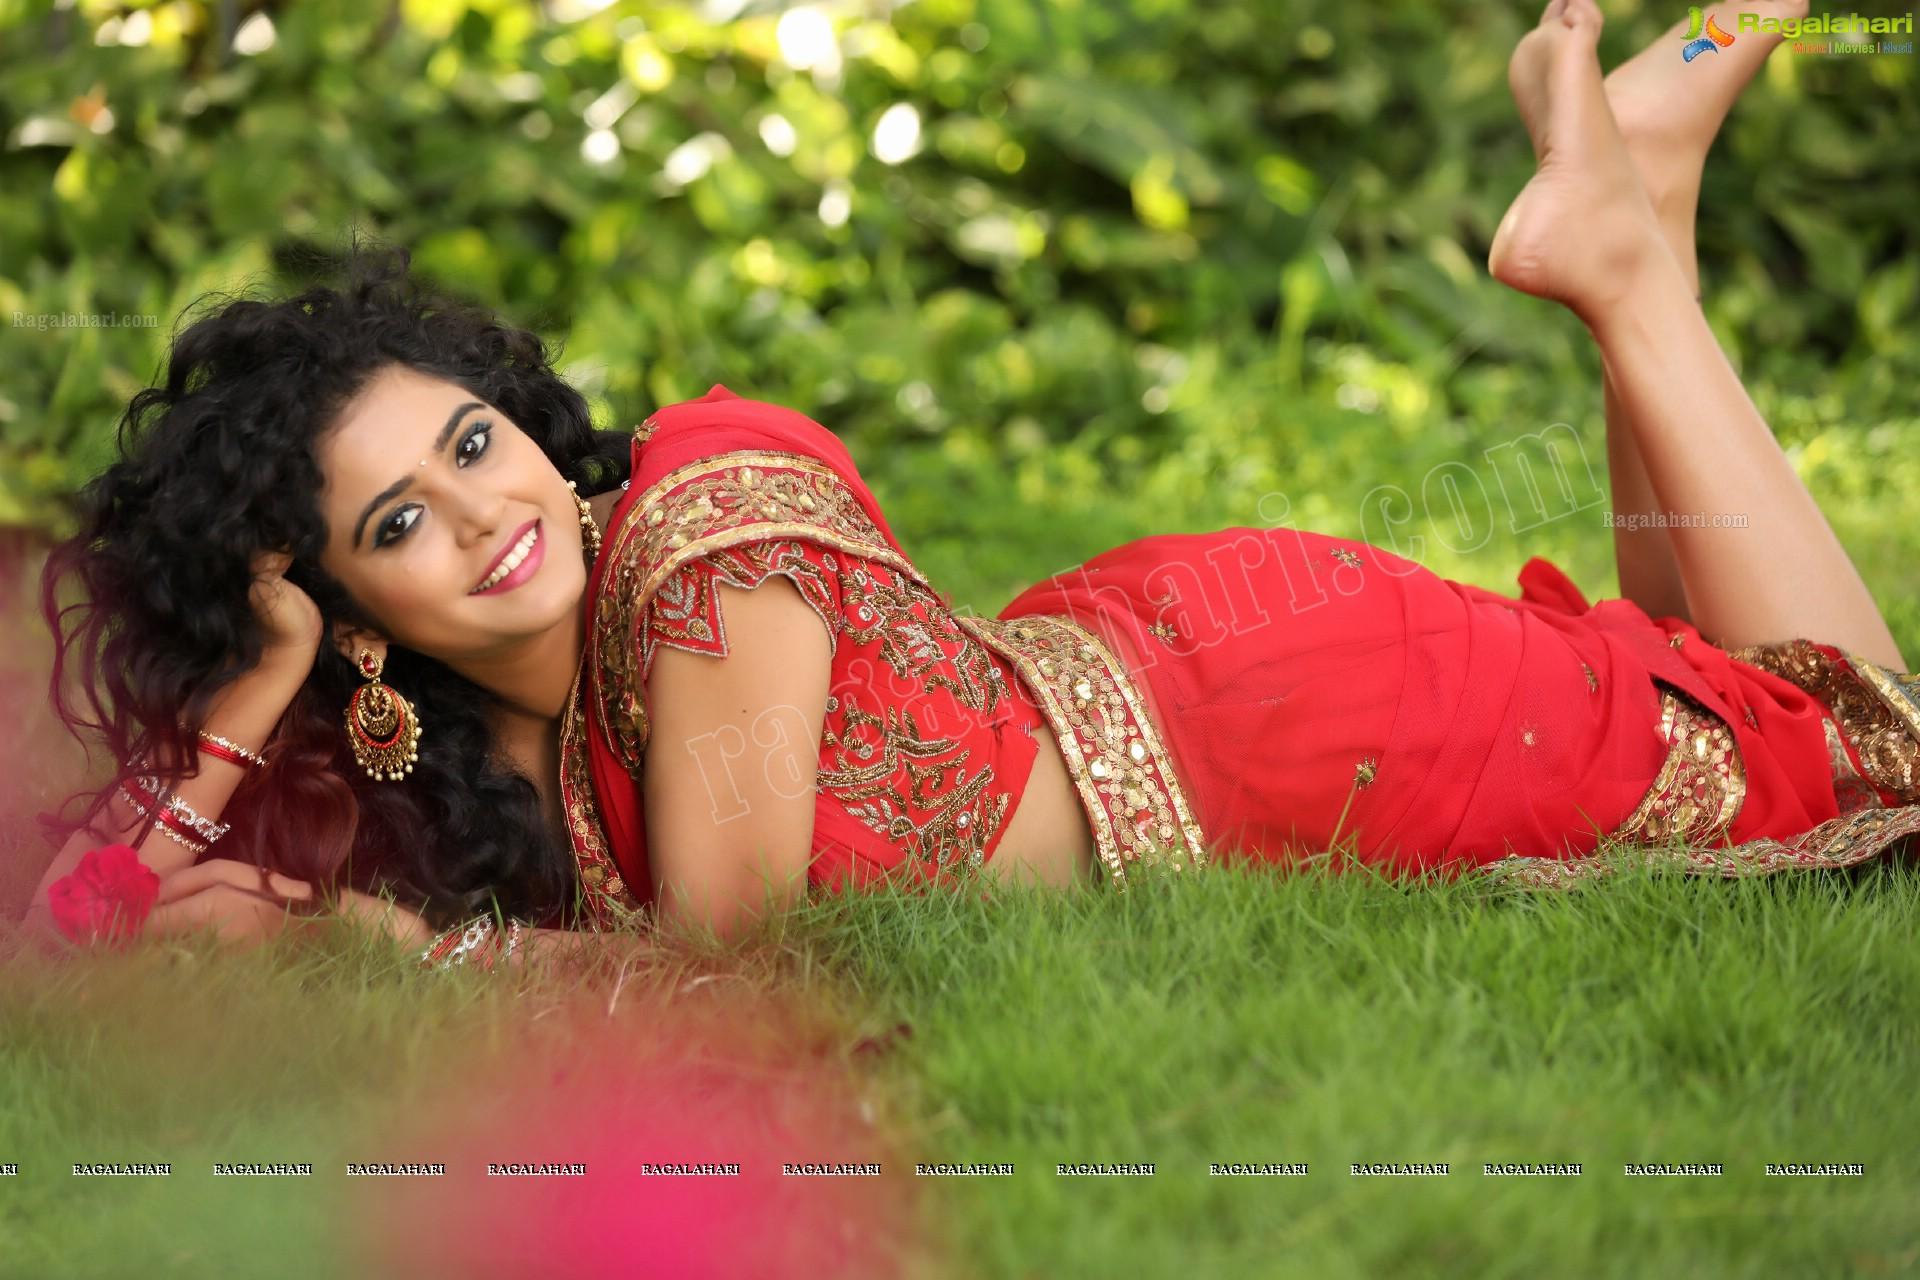 Sonakshi Varma Red Sowmya Venugopal Saree